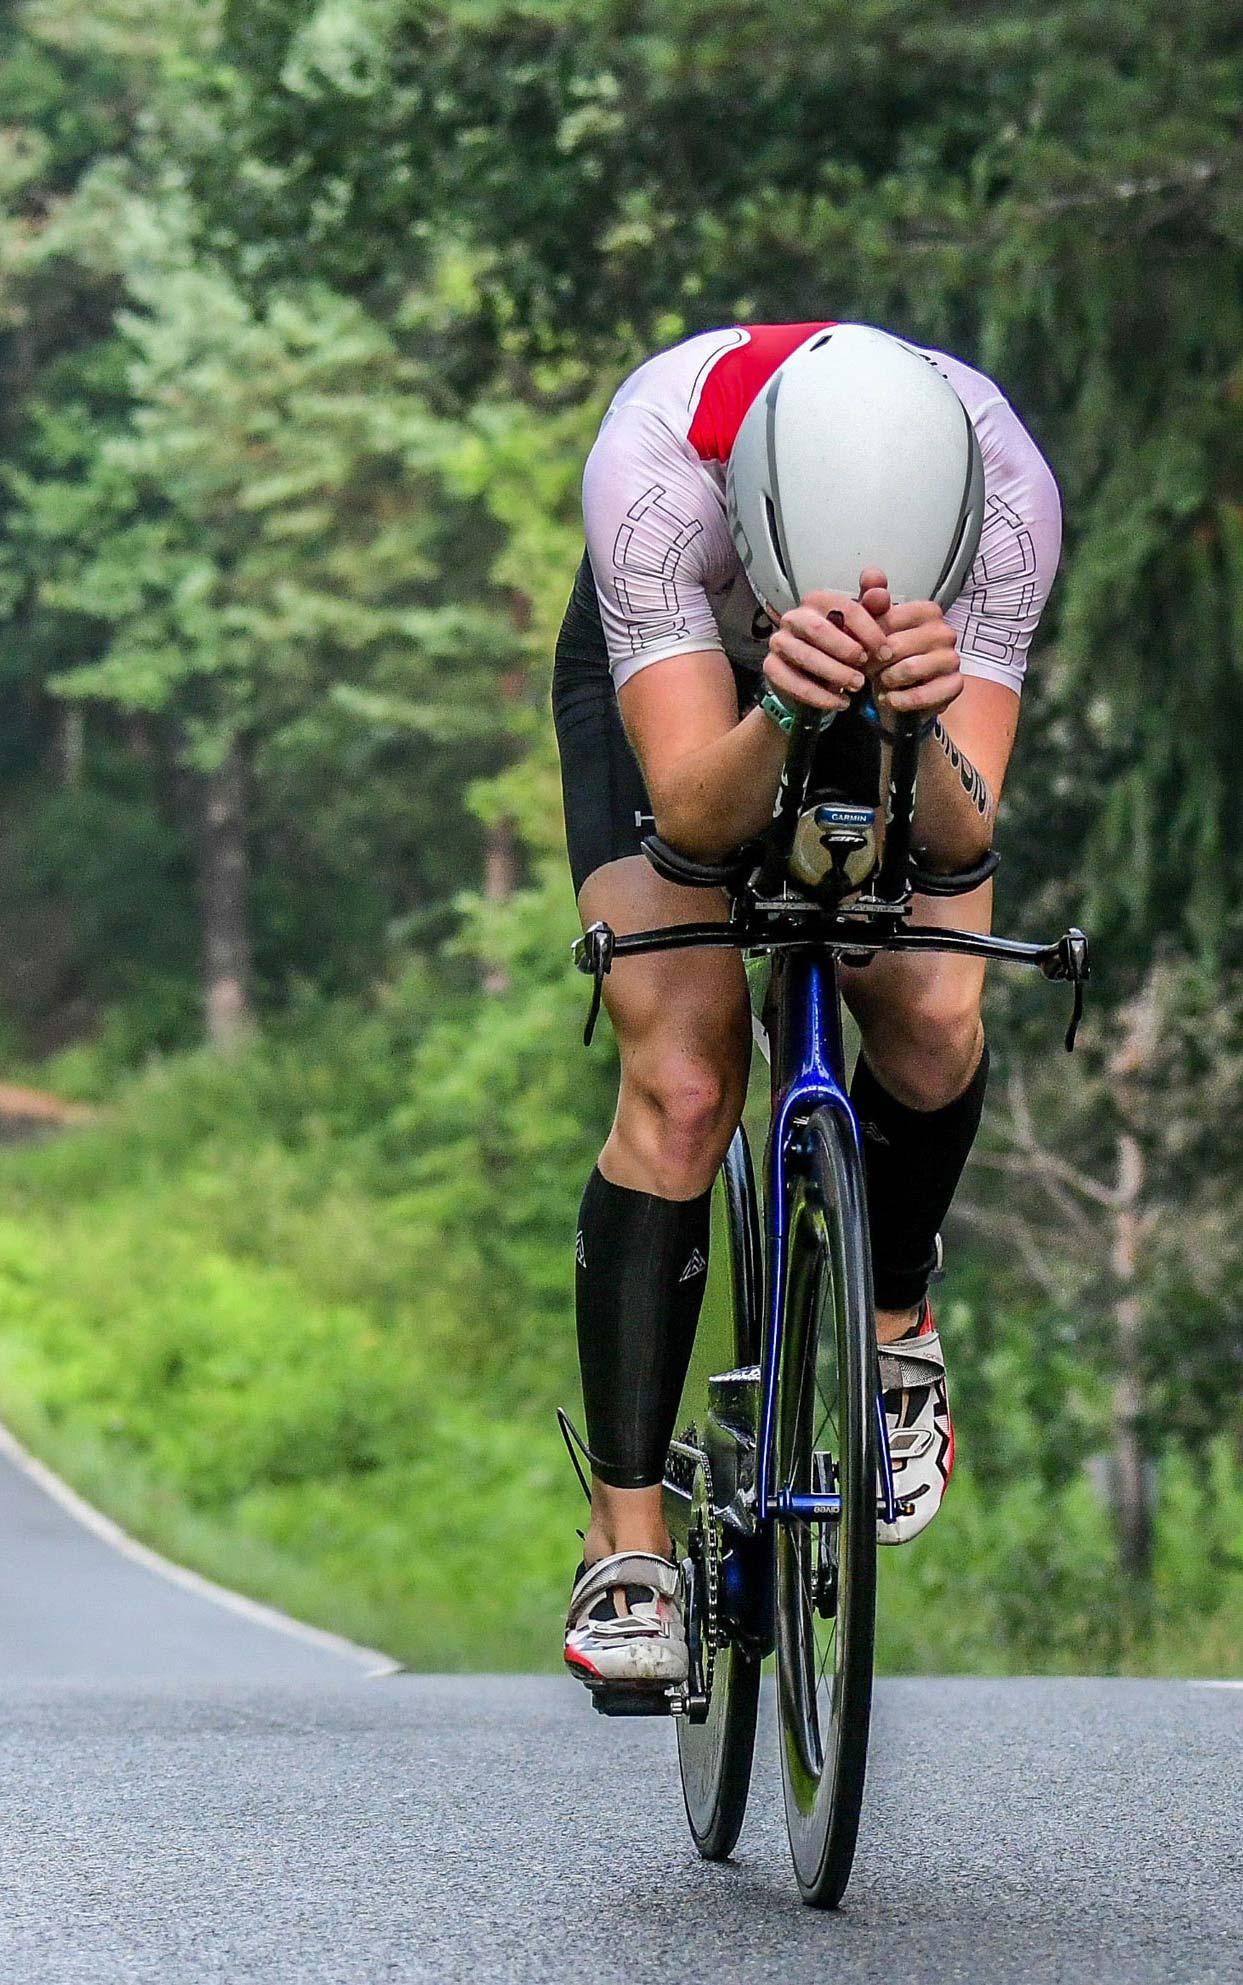 Reap-Bikes-Ben-Meir-2-cropped